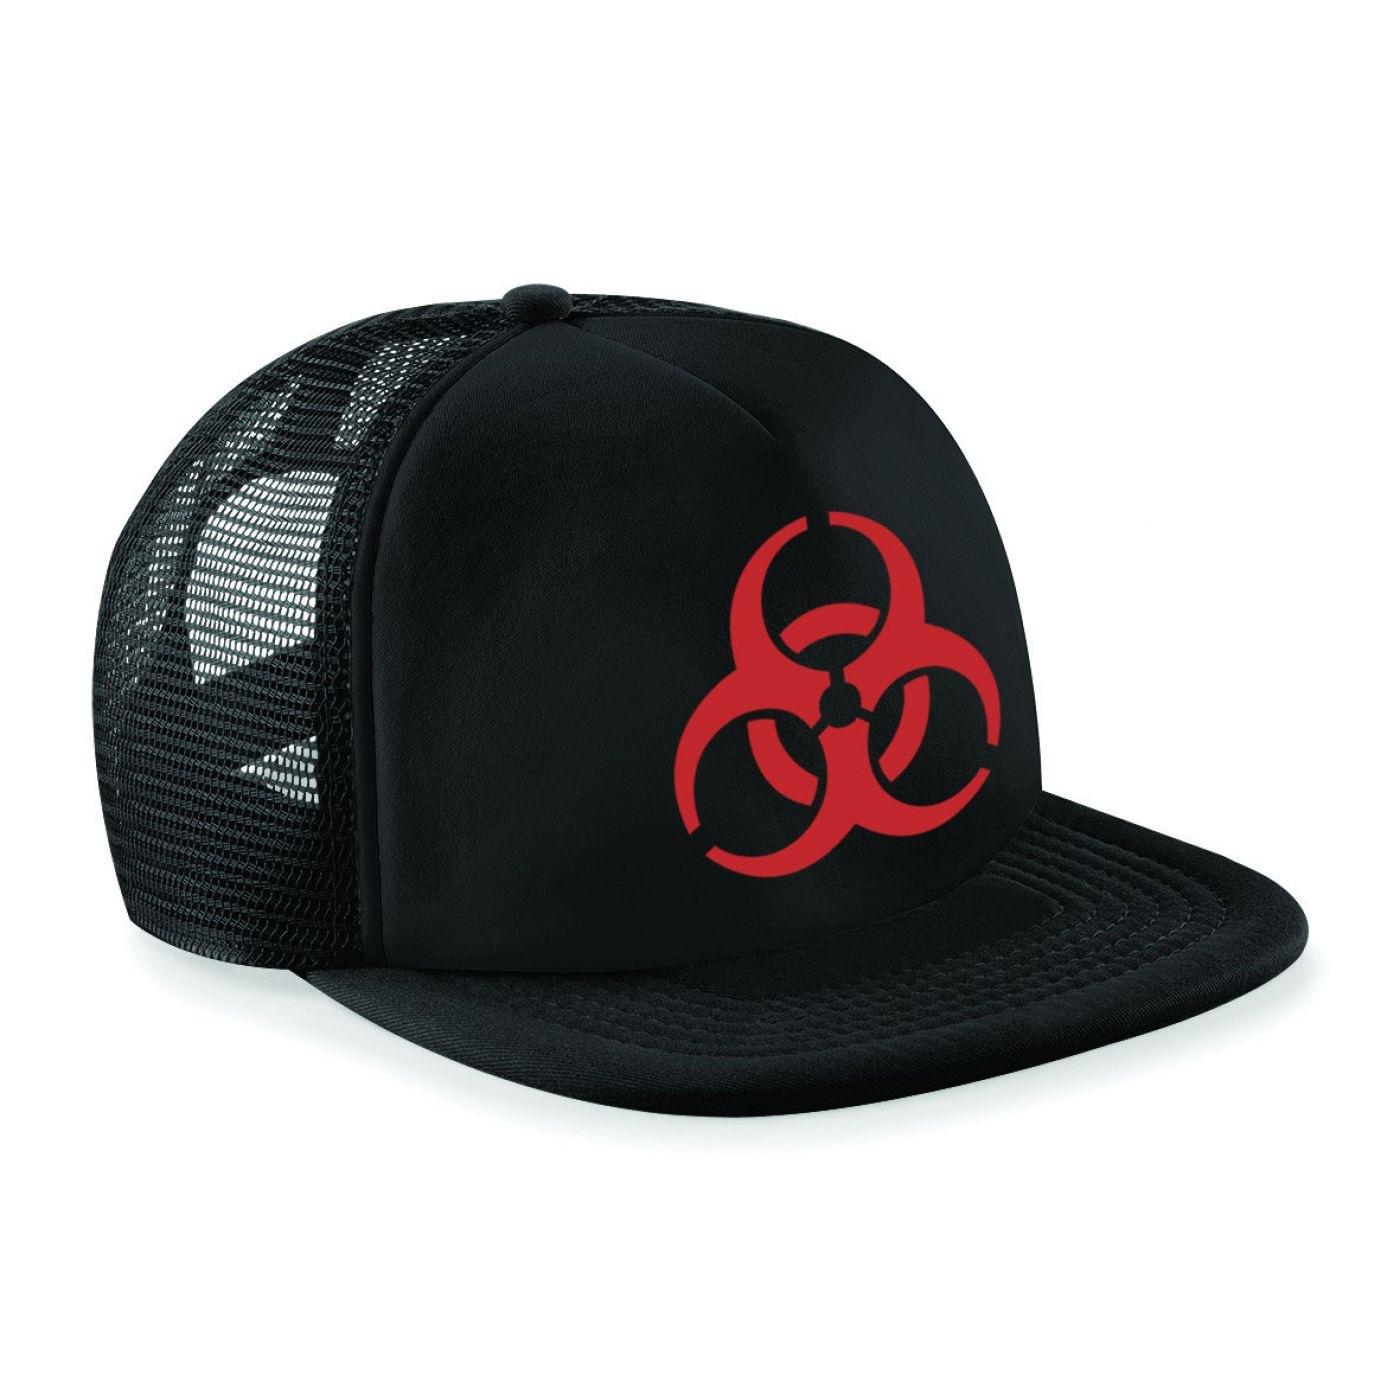 Biohazard baseball cap